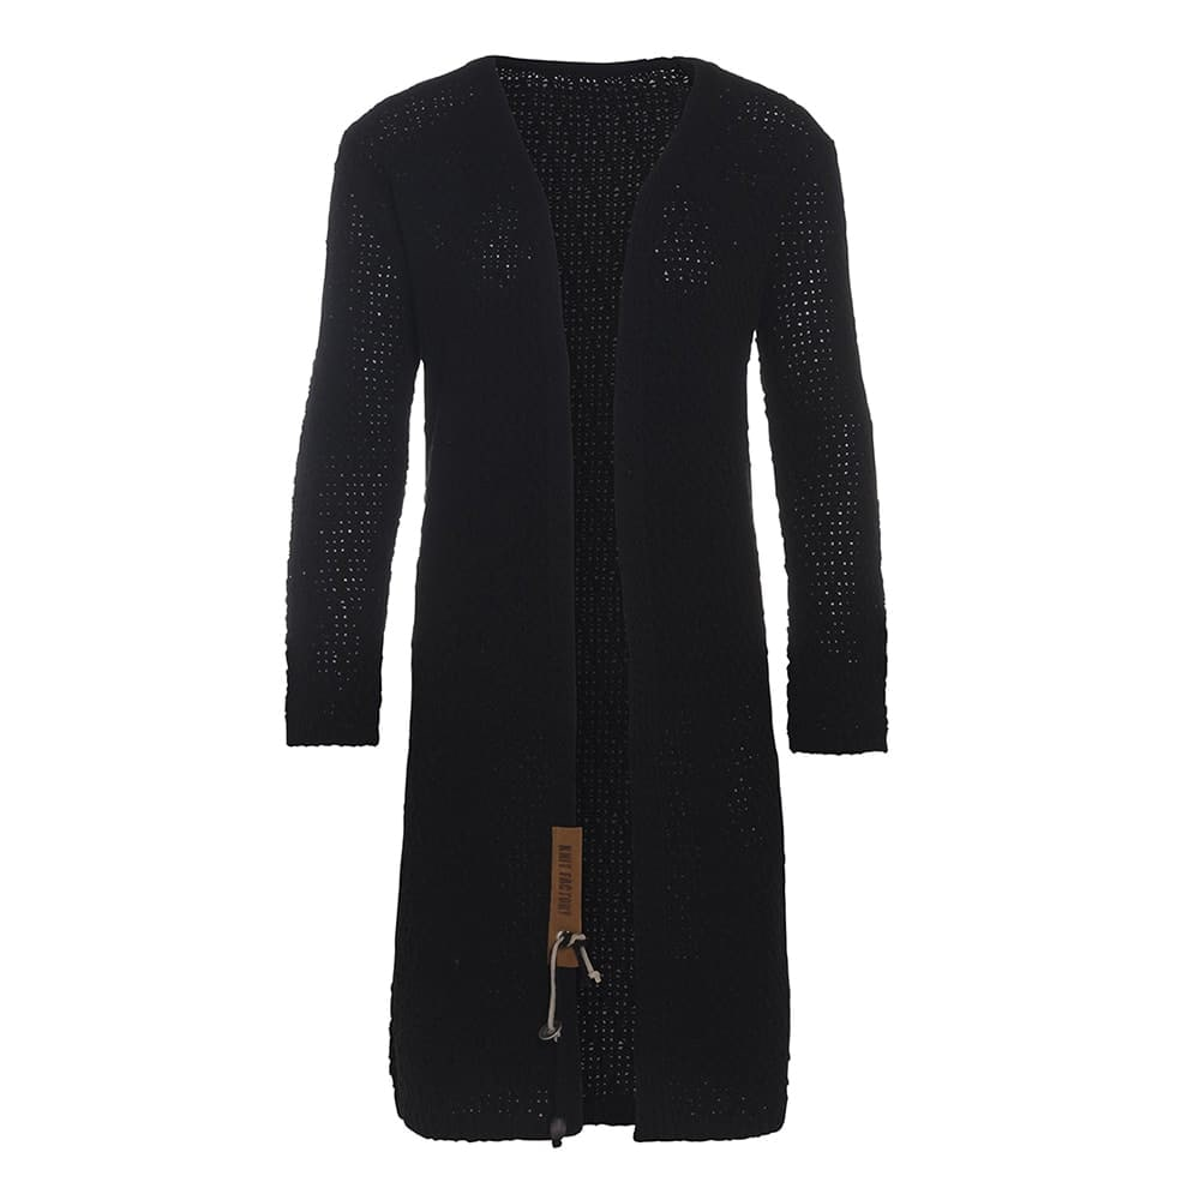 luna long knitted cardigan black 4042